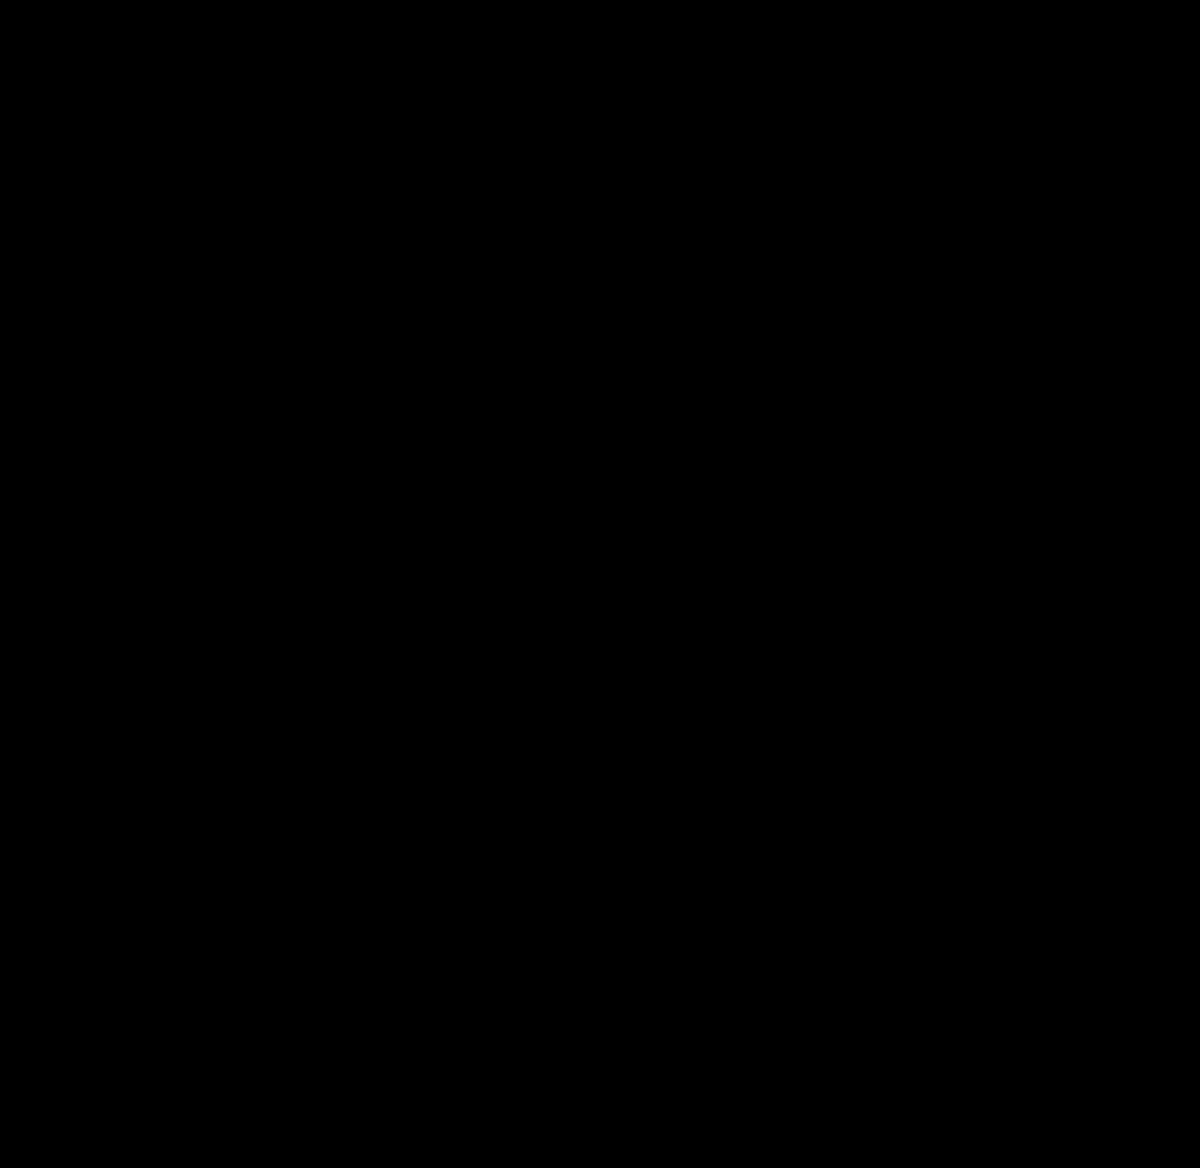 f:id:kisaragisatsuki:20201003210222p:plain